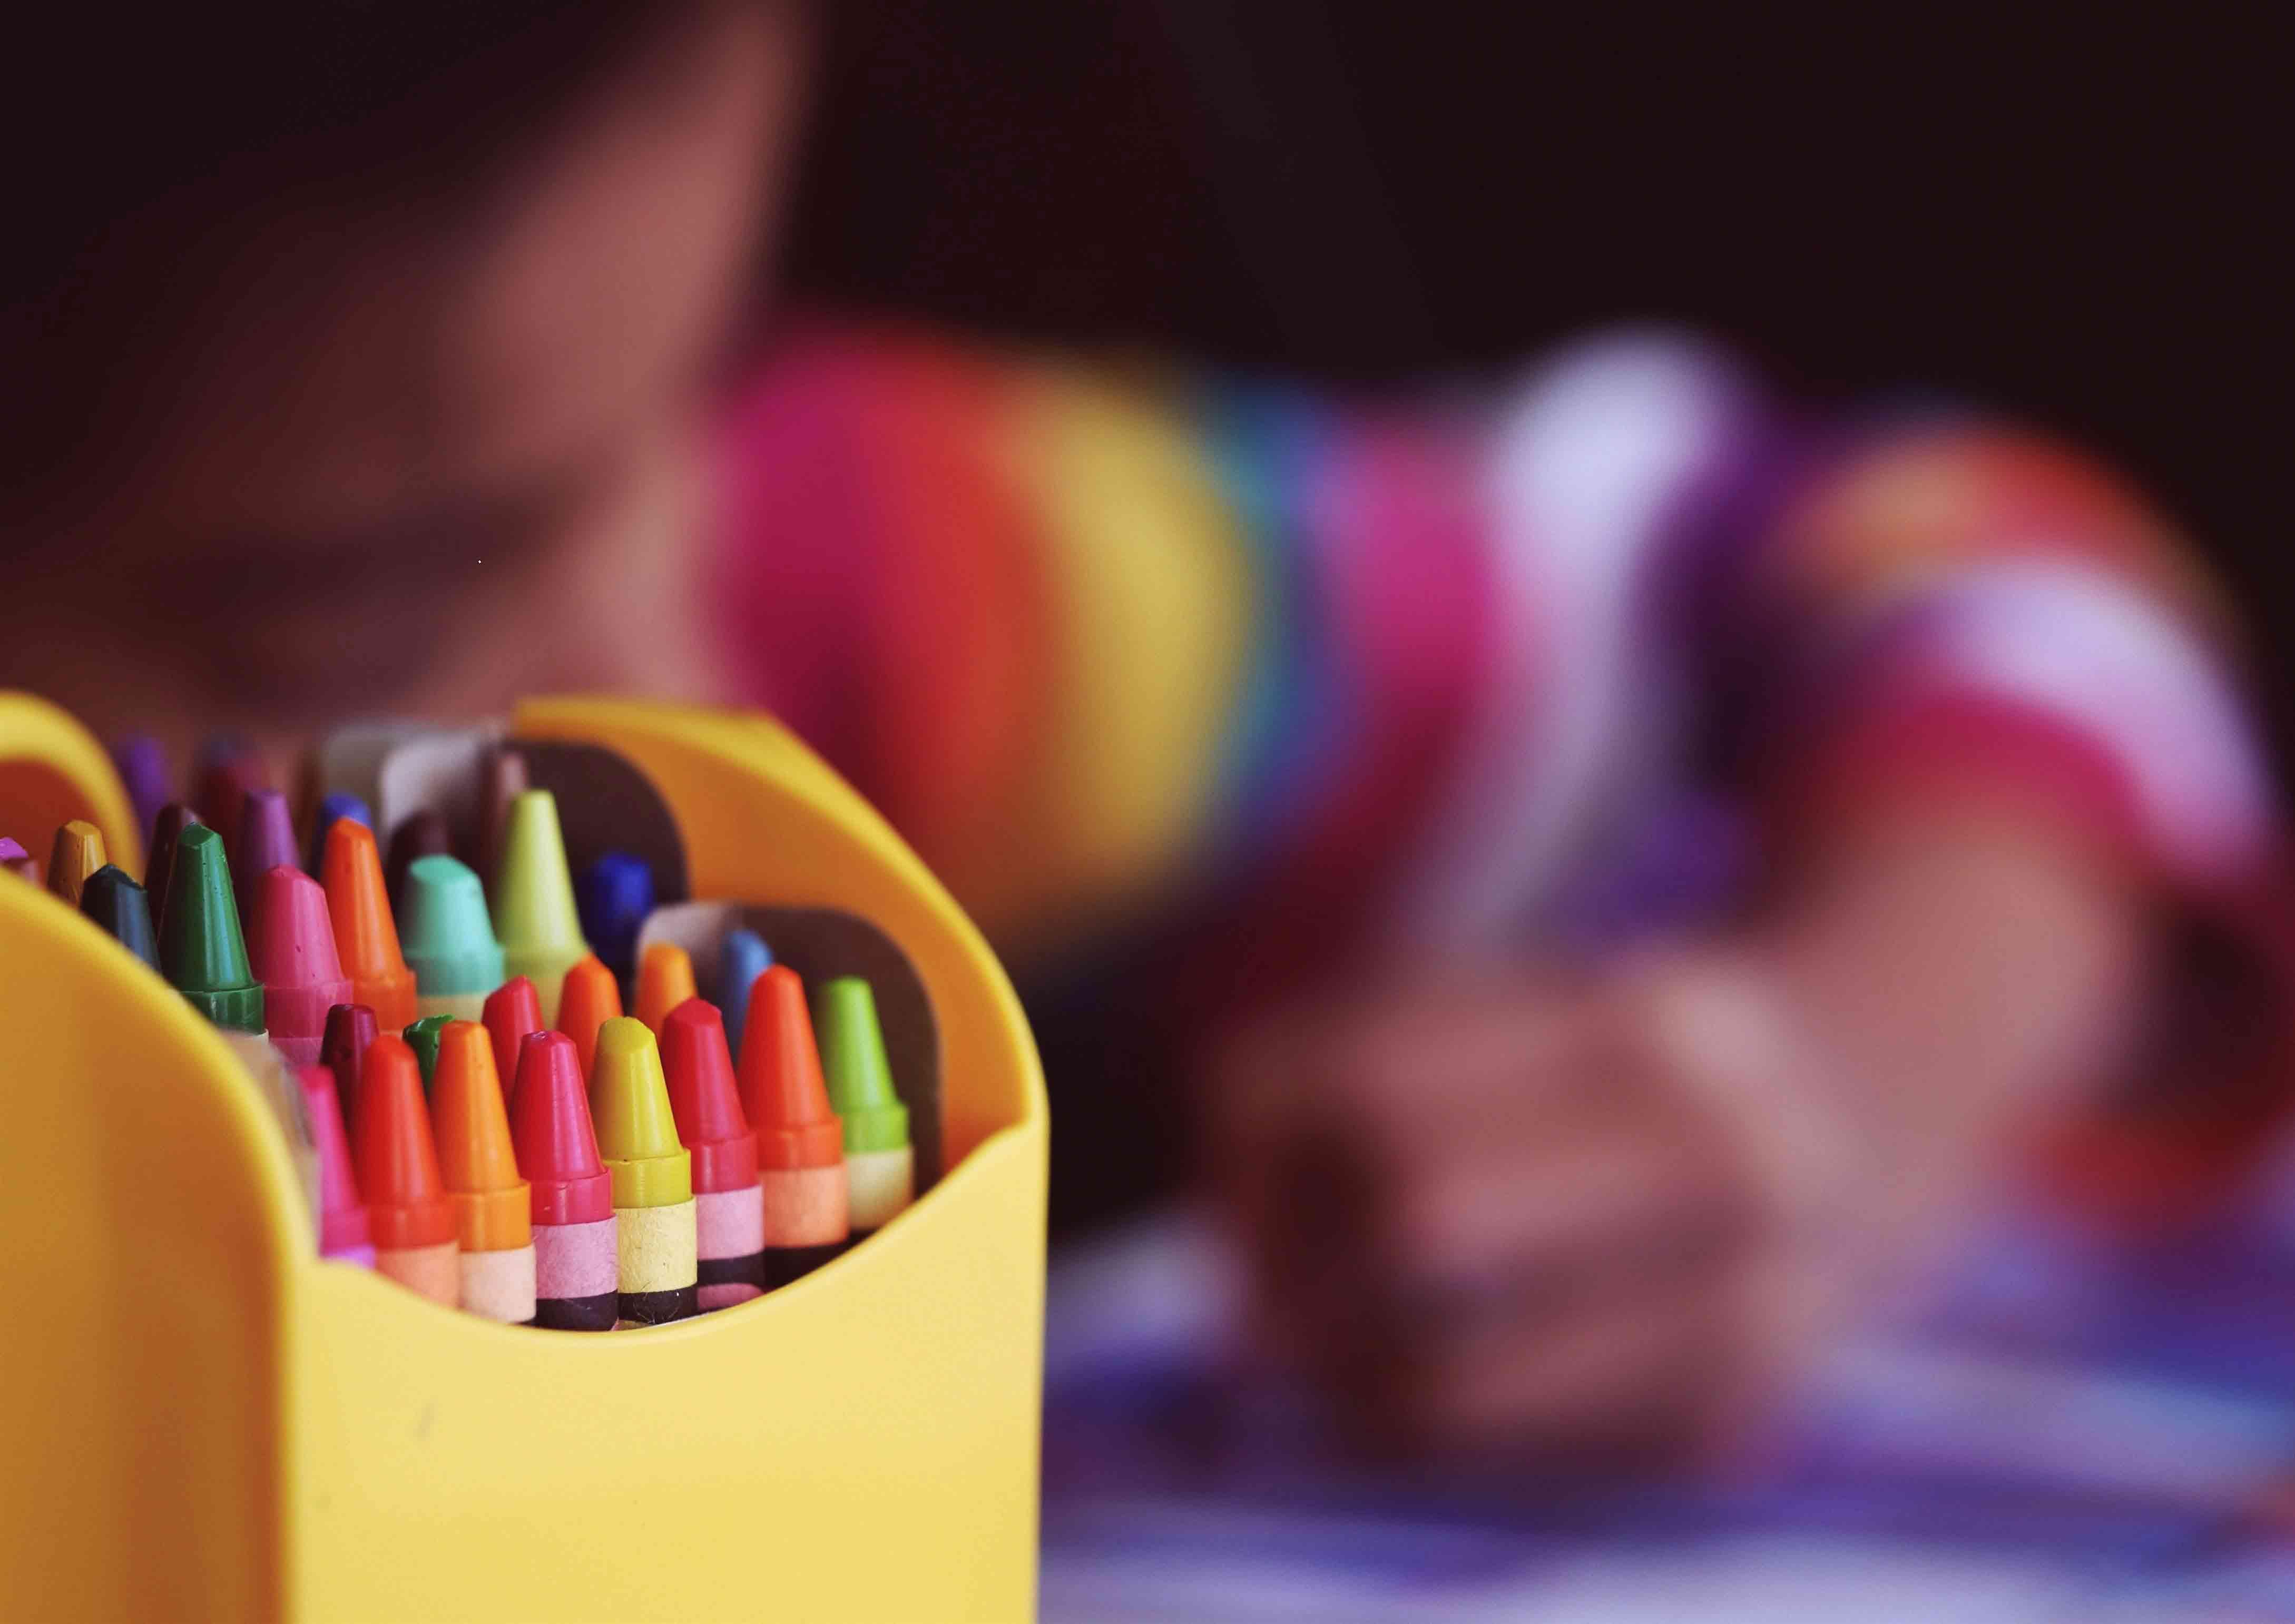 Kindkracht project kleuren hvr group